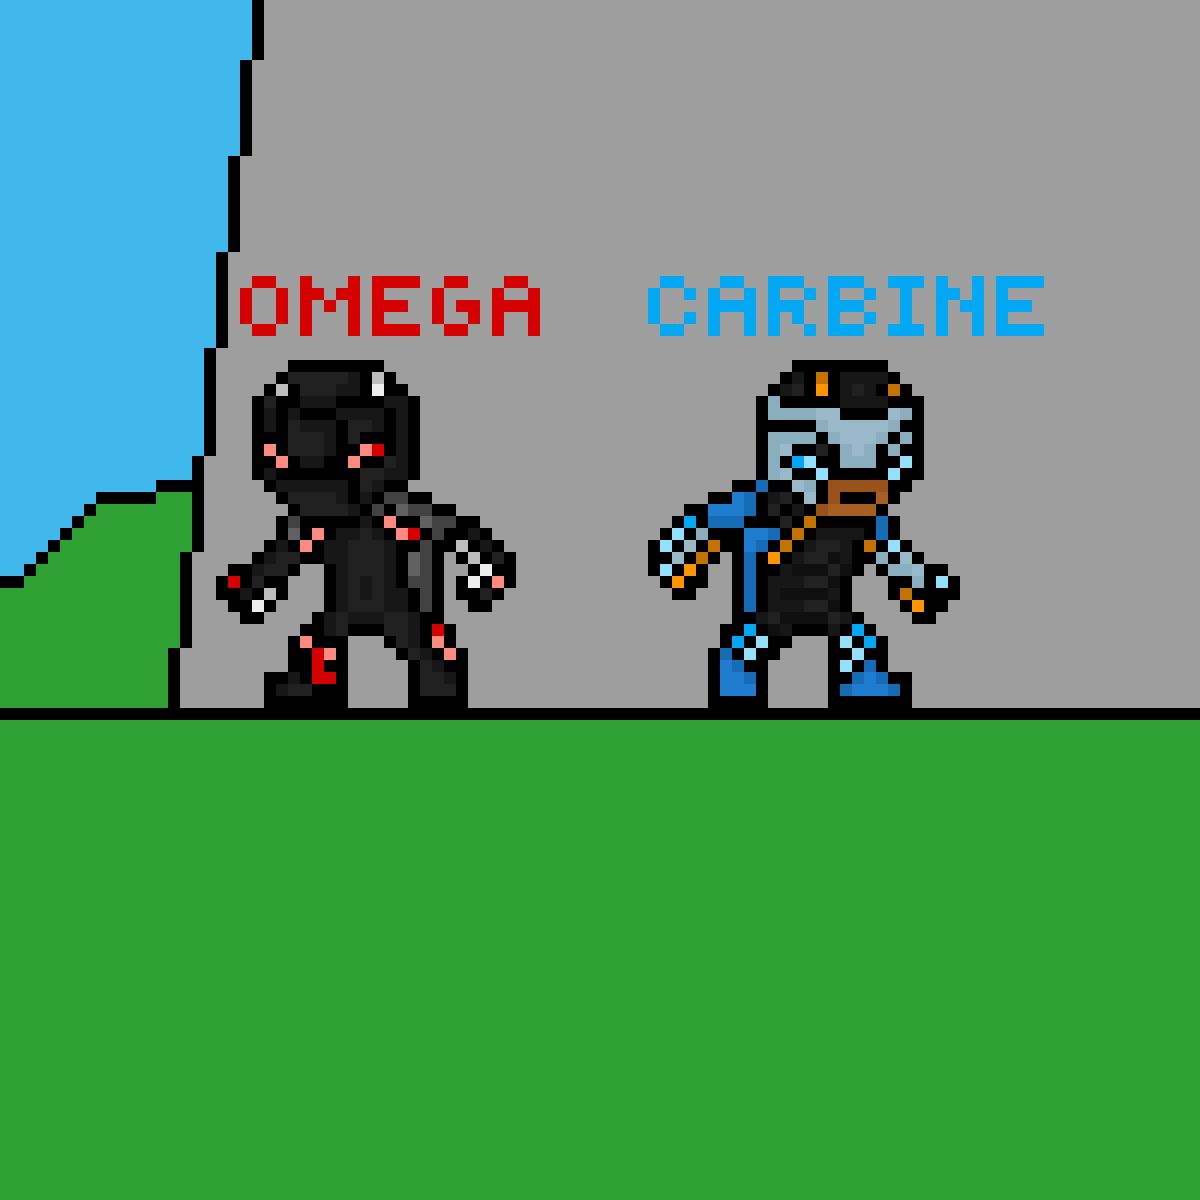 Pixilart Fortnite Omega And Carbine By Darknesslion87